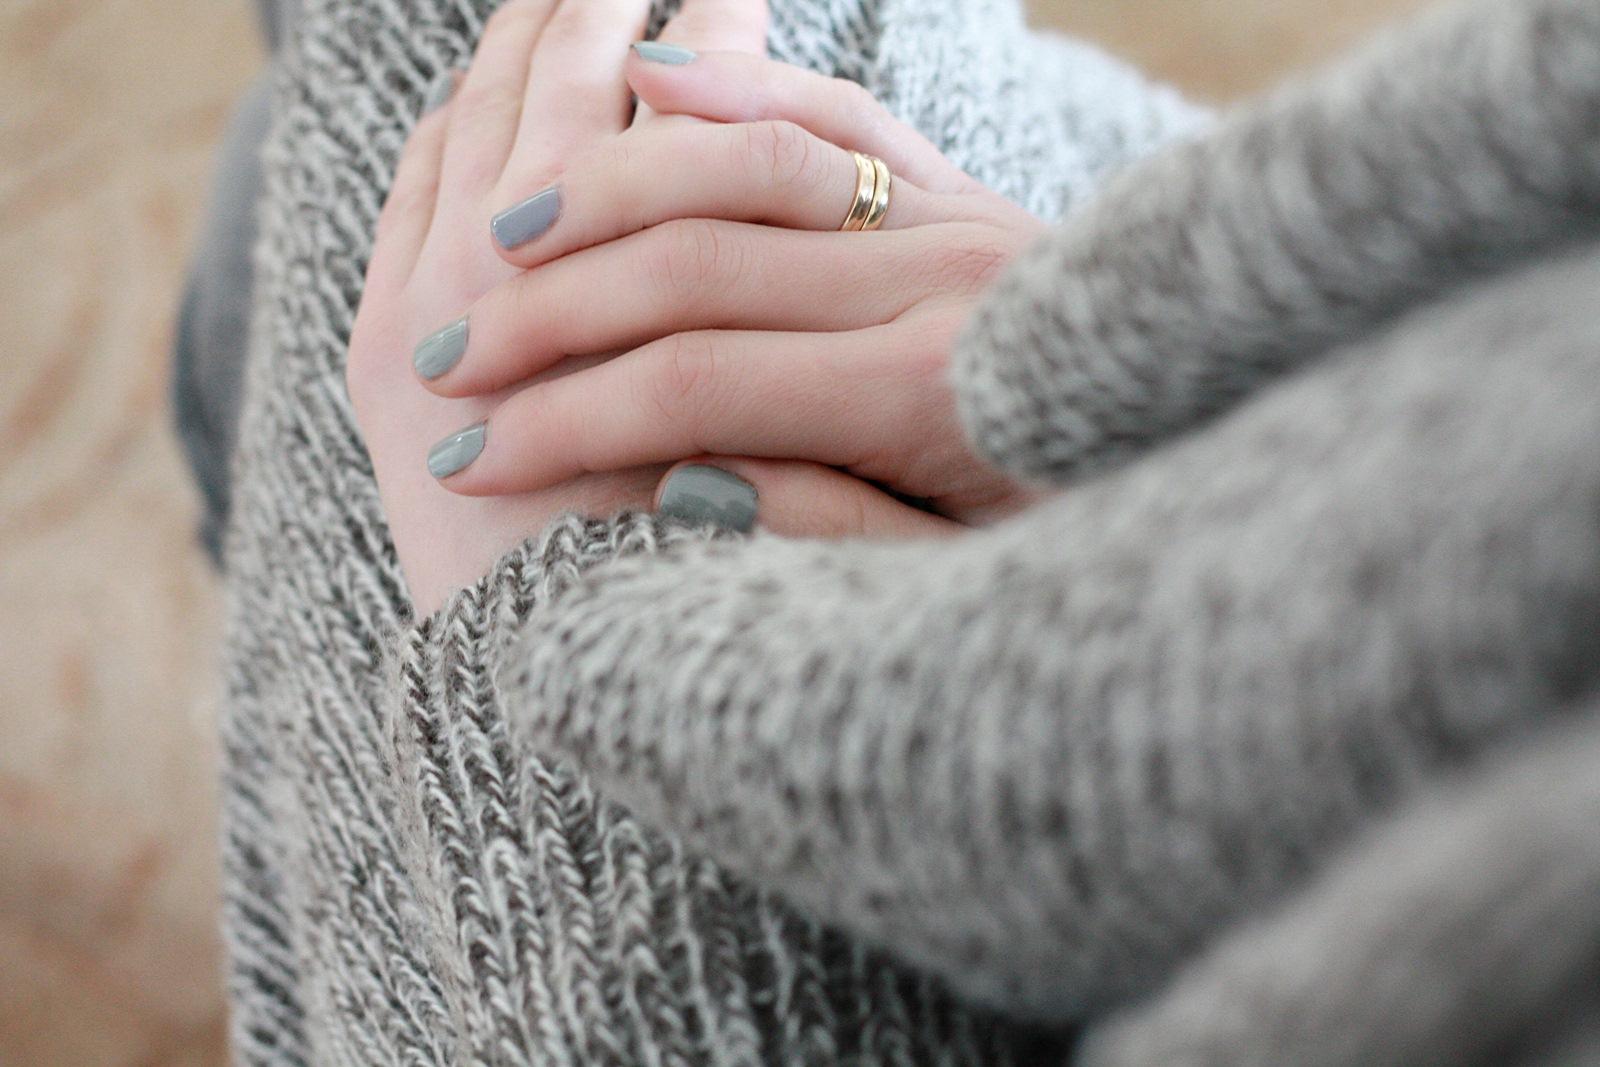 Semilac 105 Stylish Gray, Semilac 141 Lady in Gray